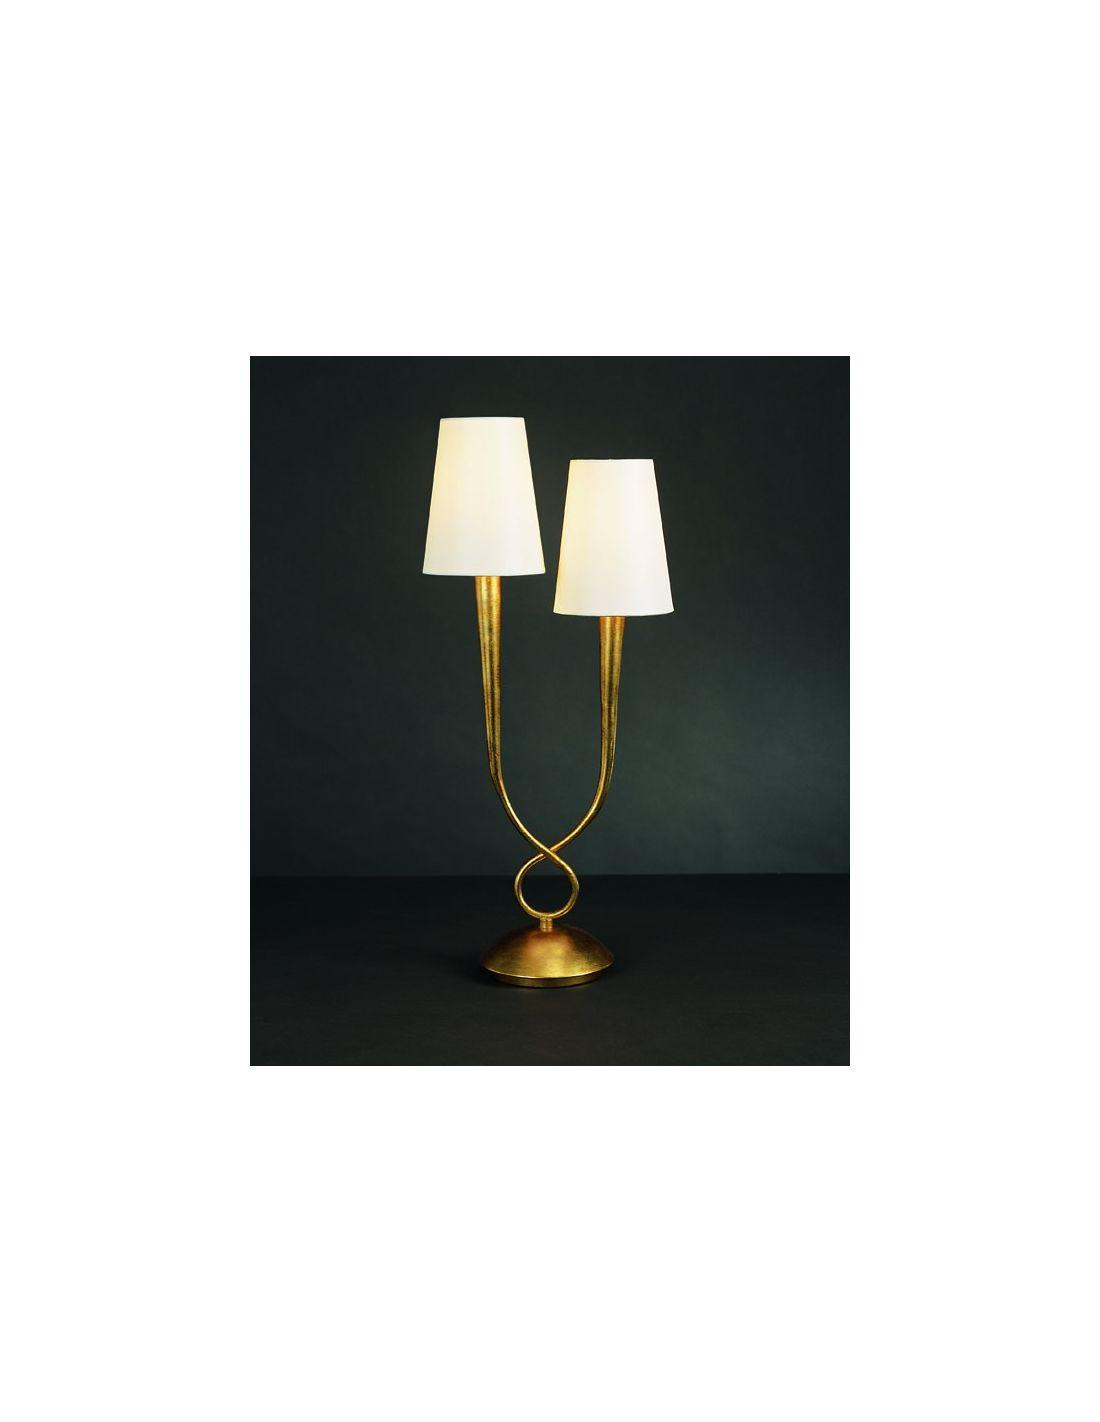 Lamparas mesa modernas lamparas mesa dos hermanas lamparas mesa sevilla iluminacion online - Lamparas en dos hermanas ...